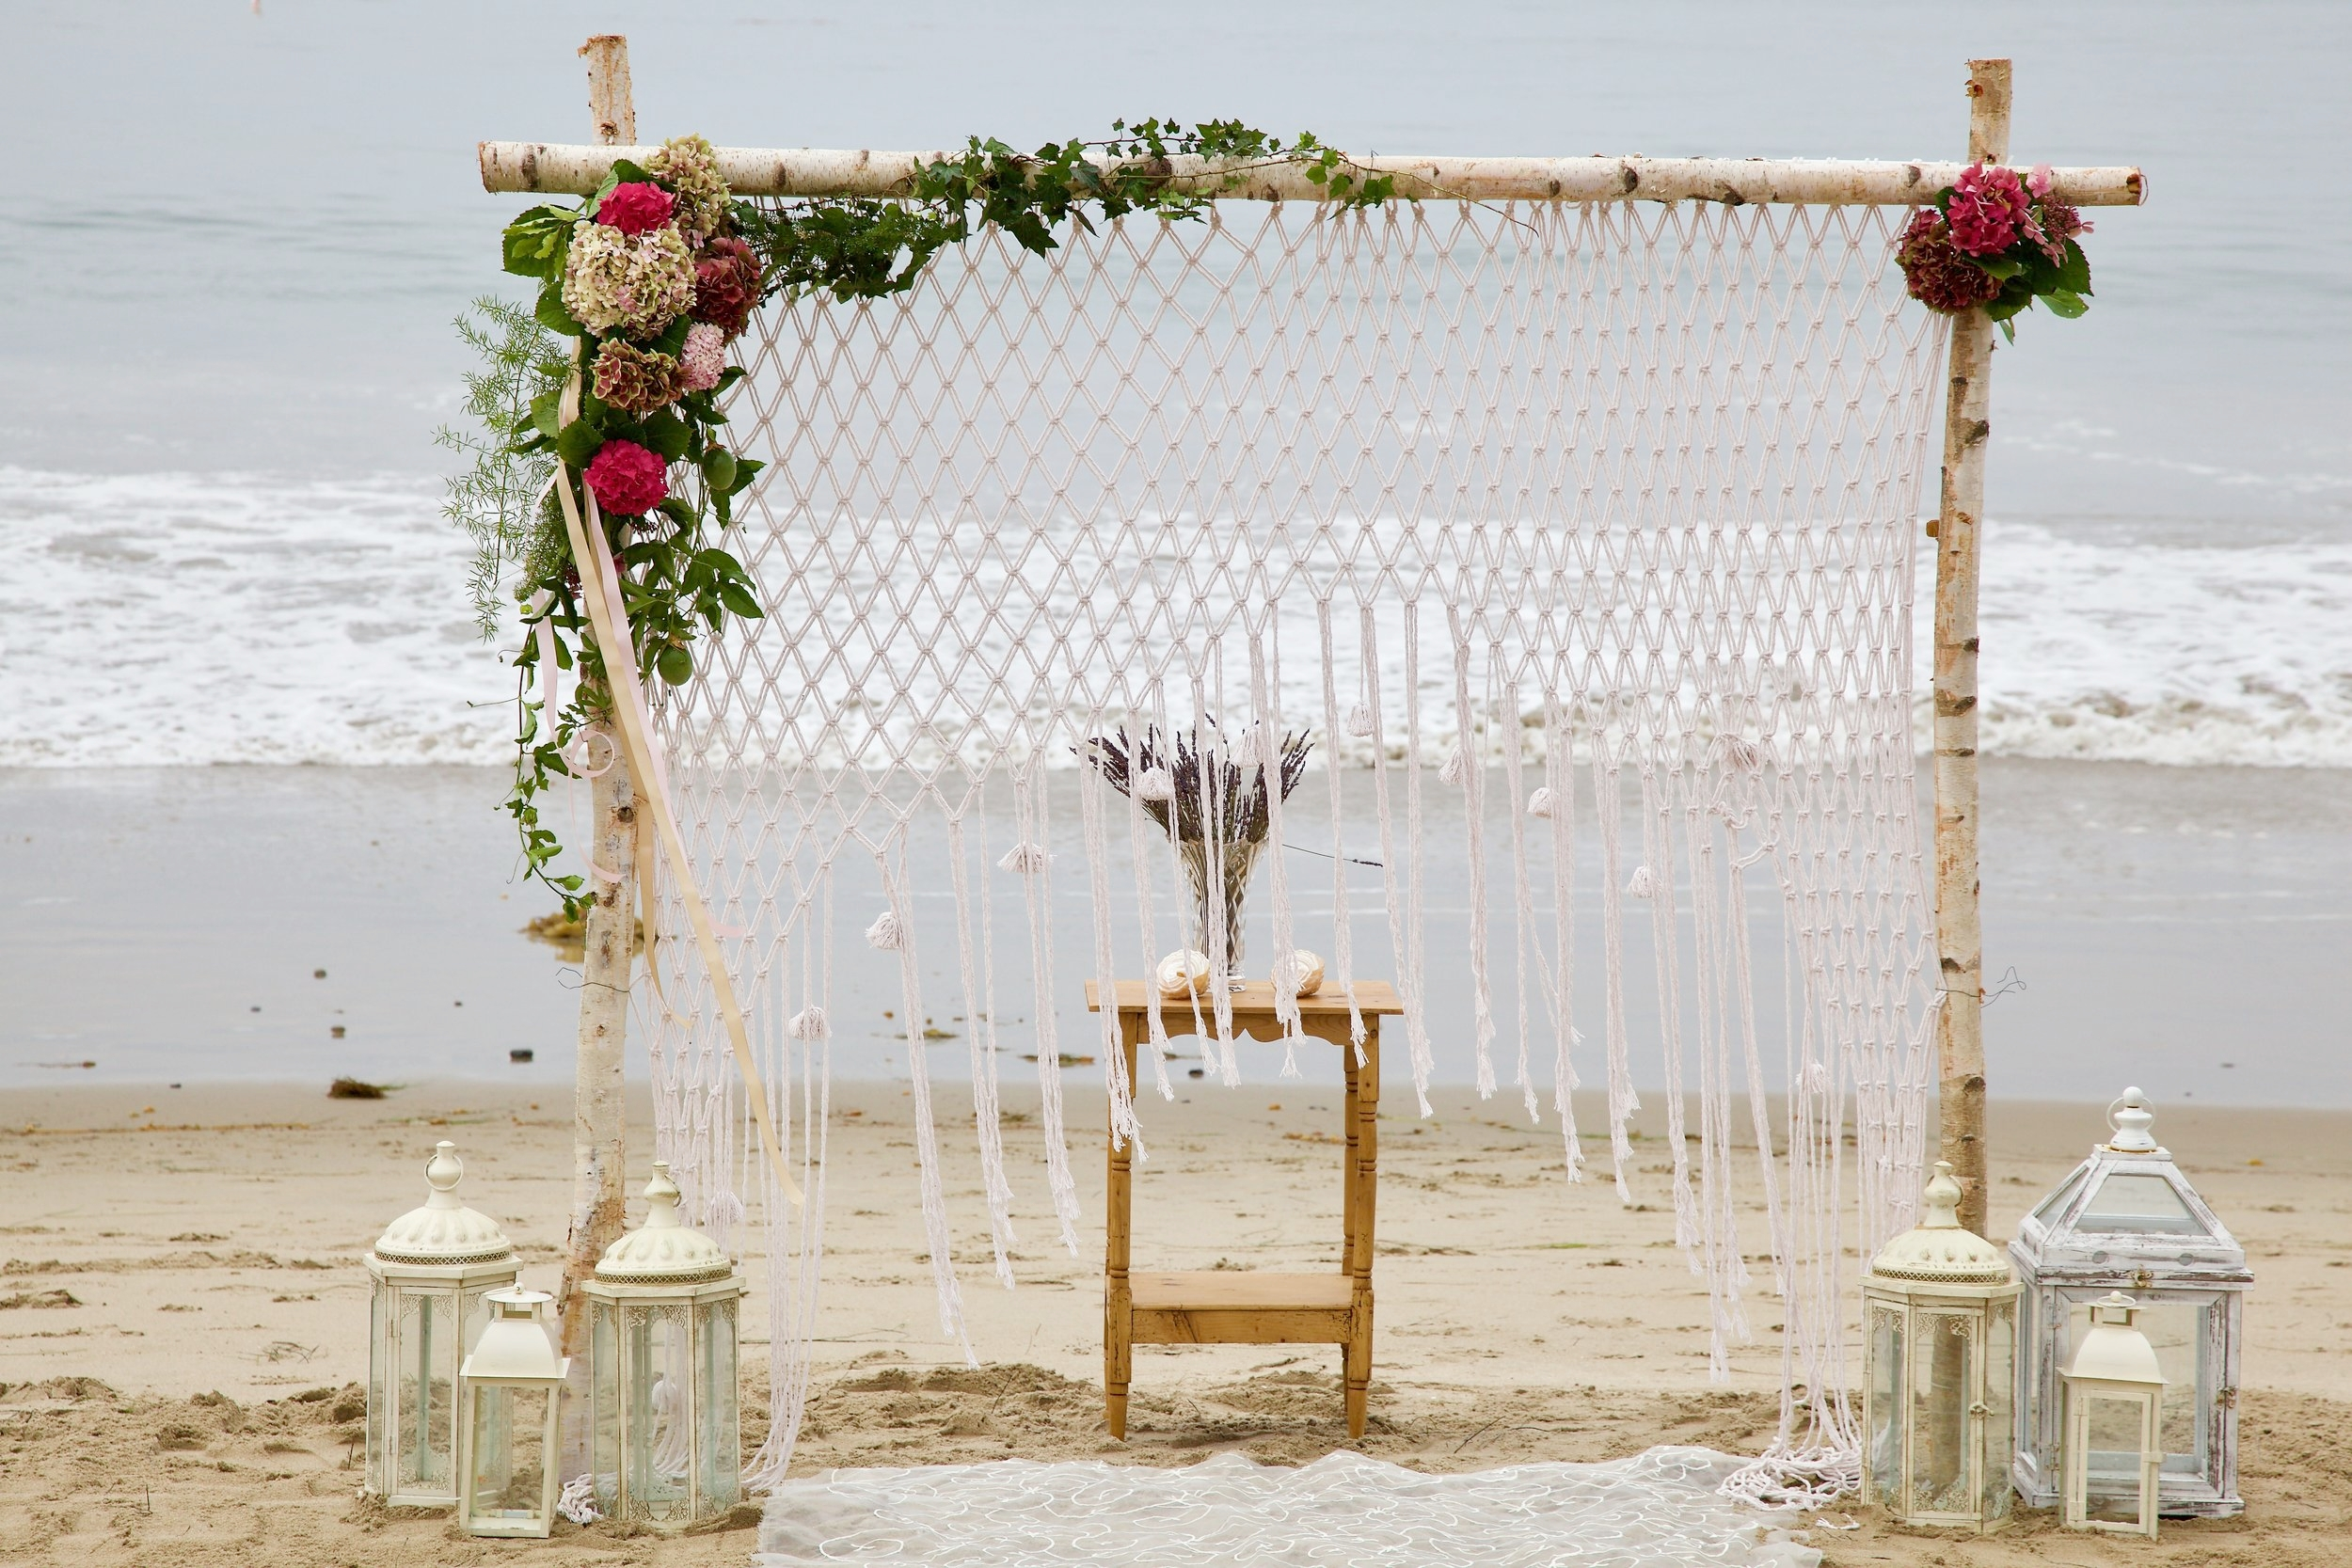 THE BOHEMIAN BRIDE ARCH